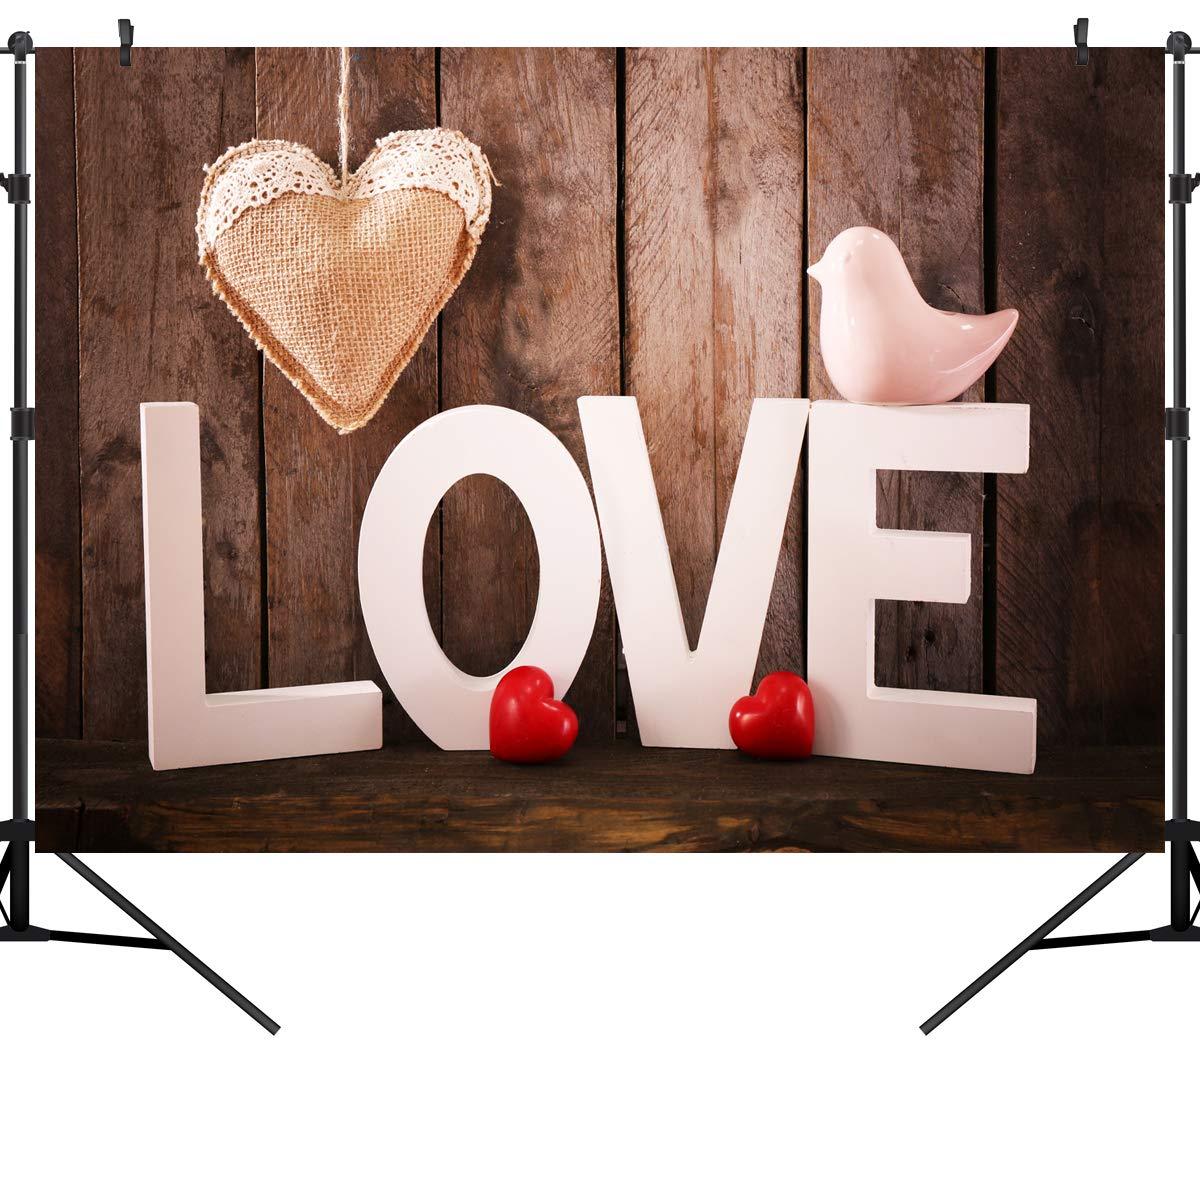 OUYIDA 7X5FT バレンタインデーテーマ 写真撮影用背景布 コンピューター印刷ビニール背景幕 TD58 10X8FT VDD005 B07L4LVX33